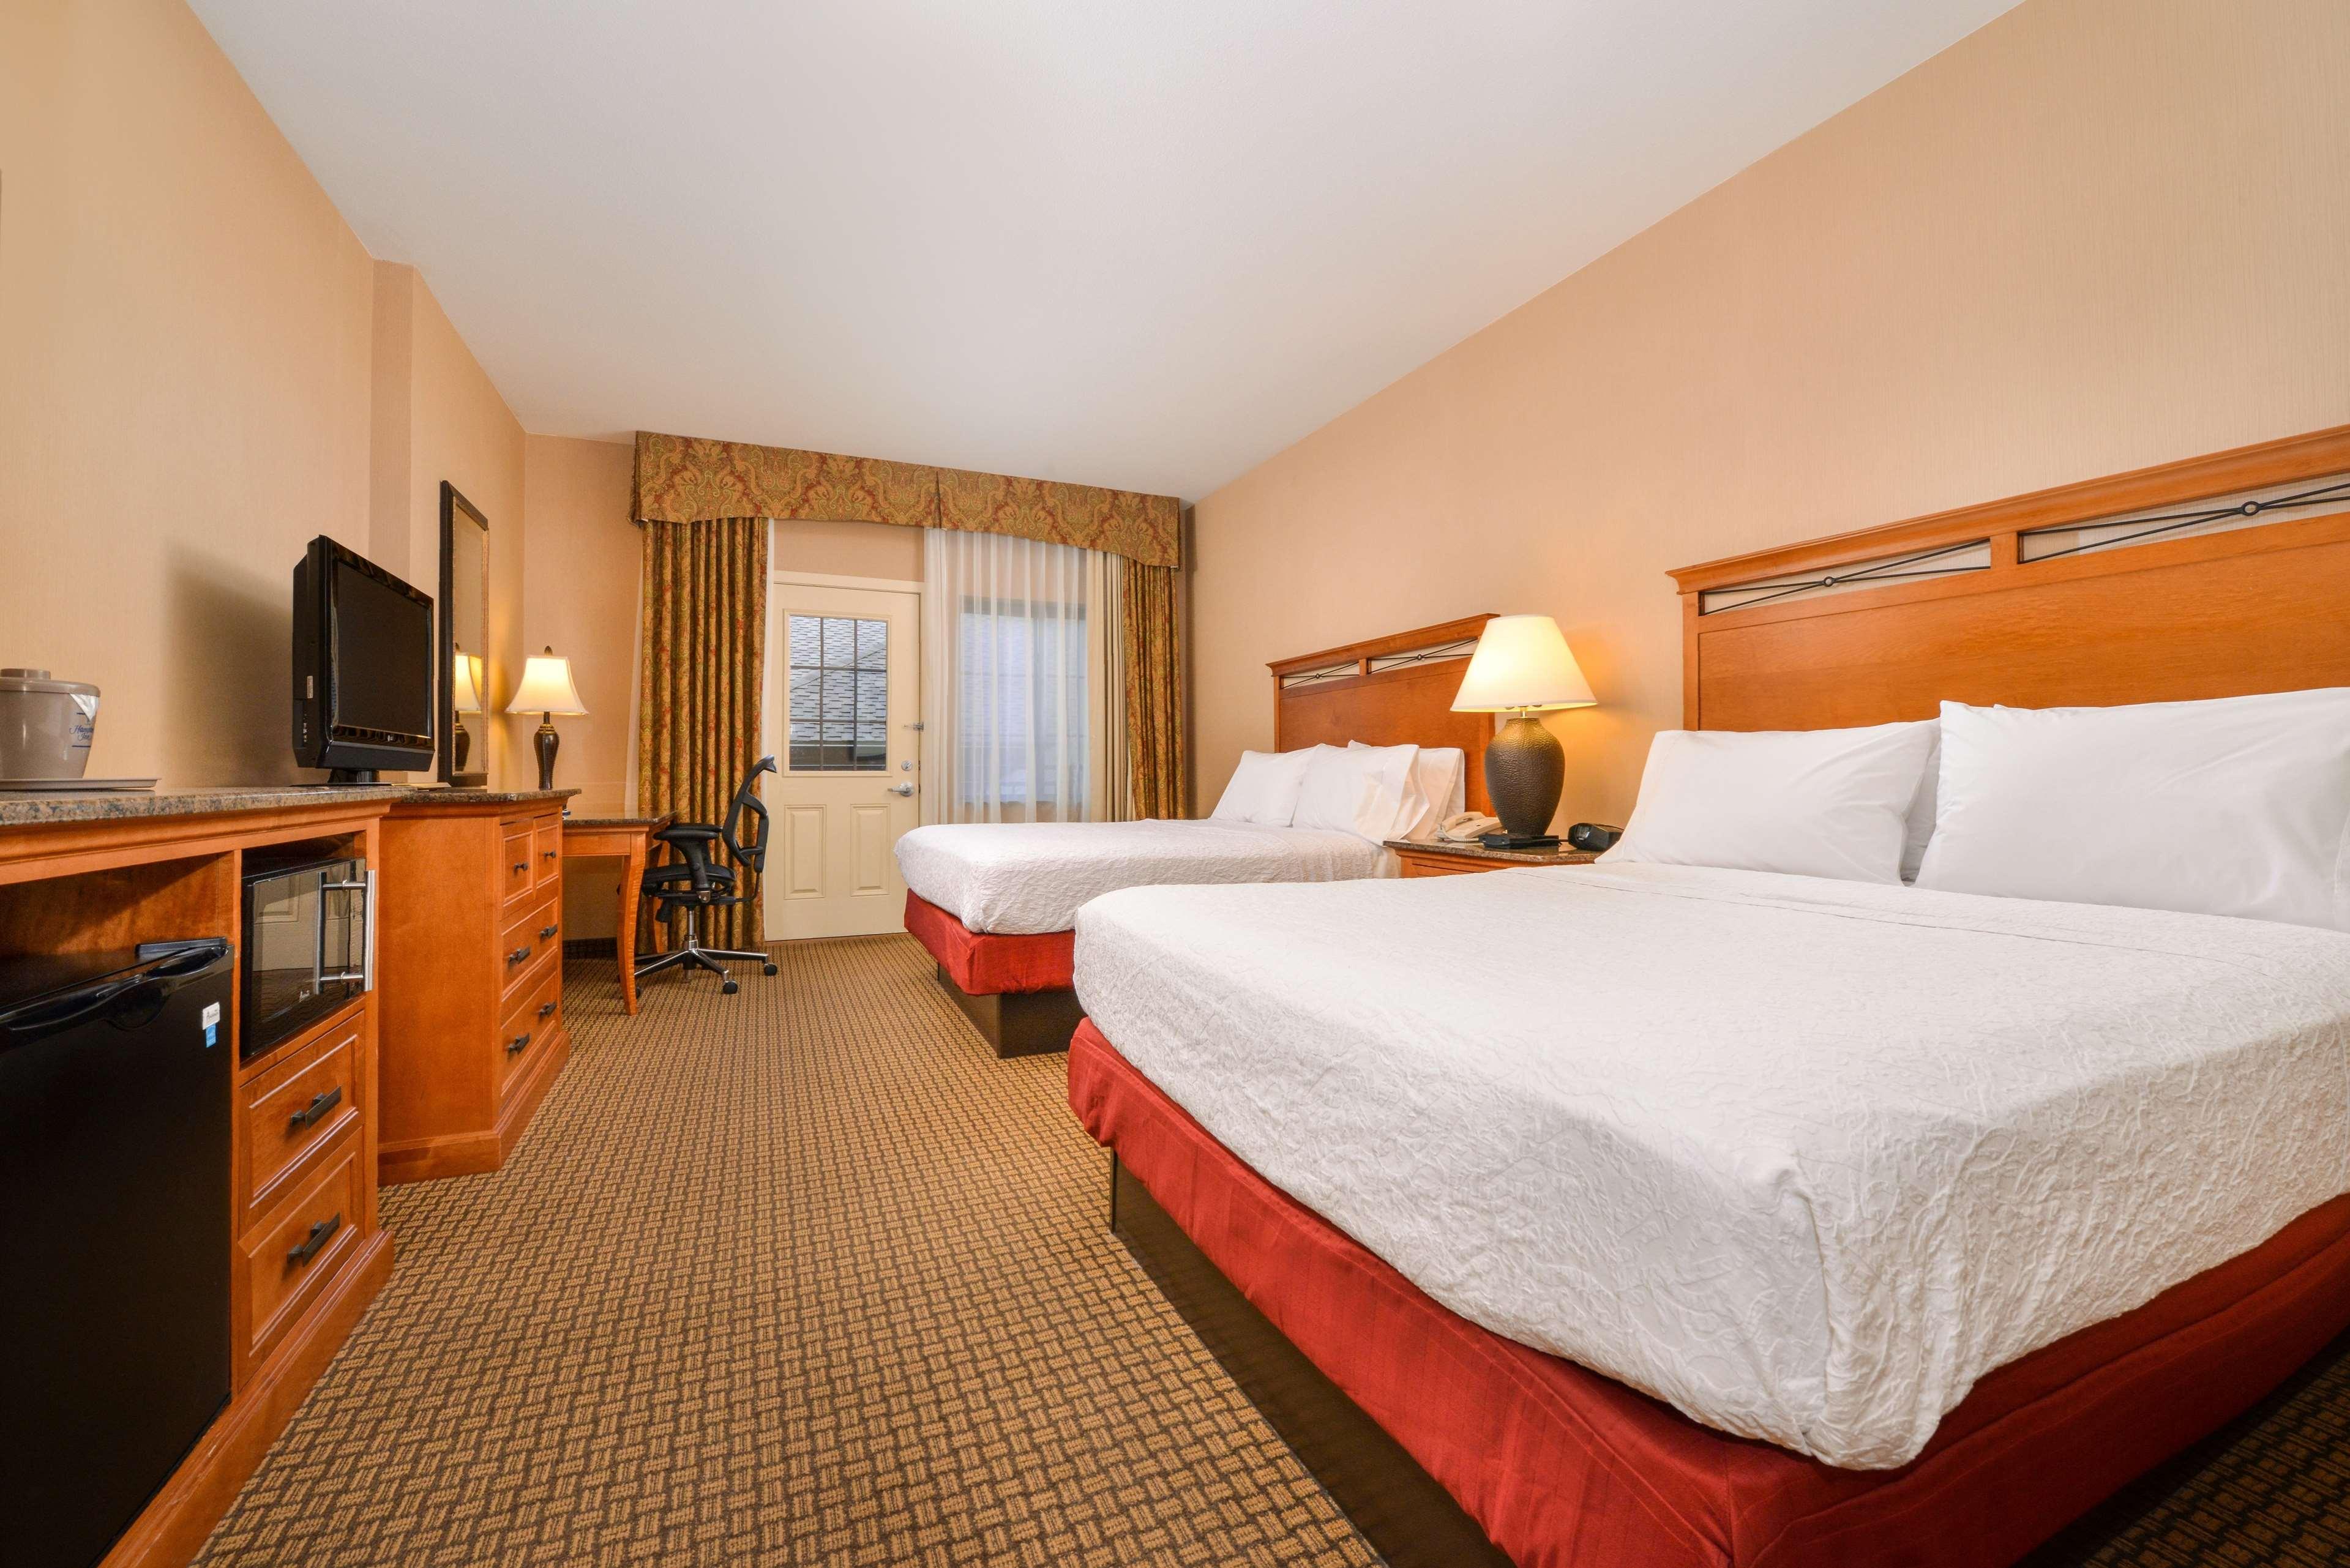 Hampton Inn & Suites Coeur d' Alene image 24